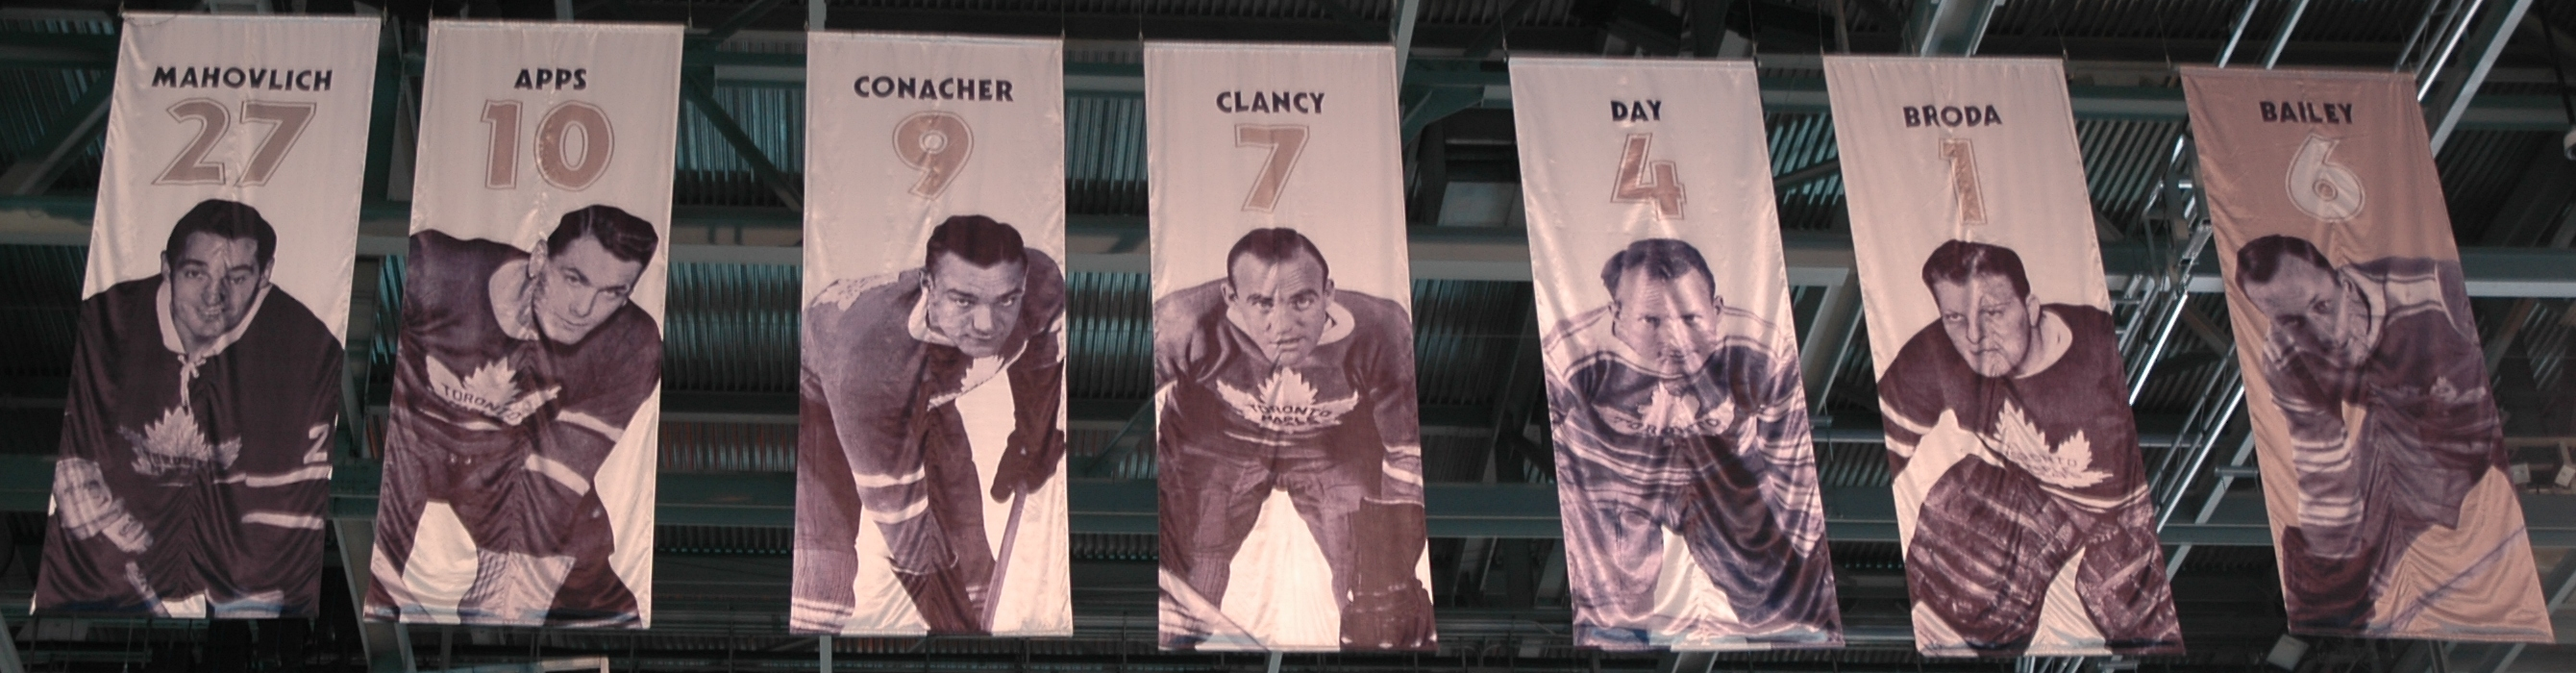 Maple_Leafs_Banner_3.jpg